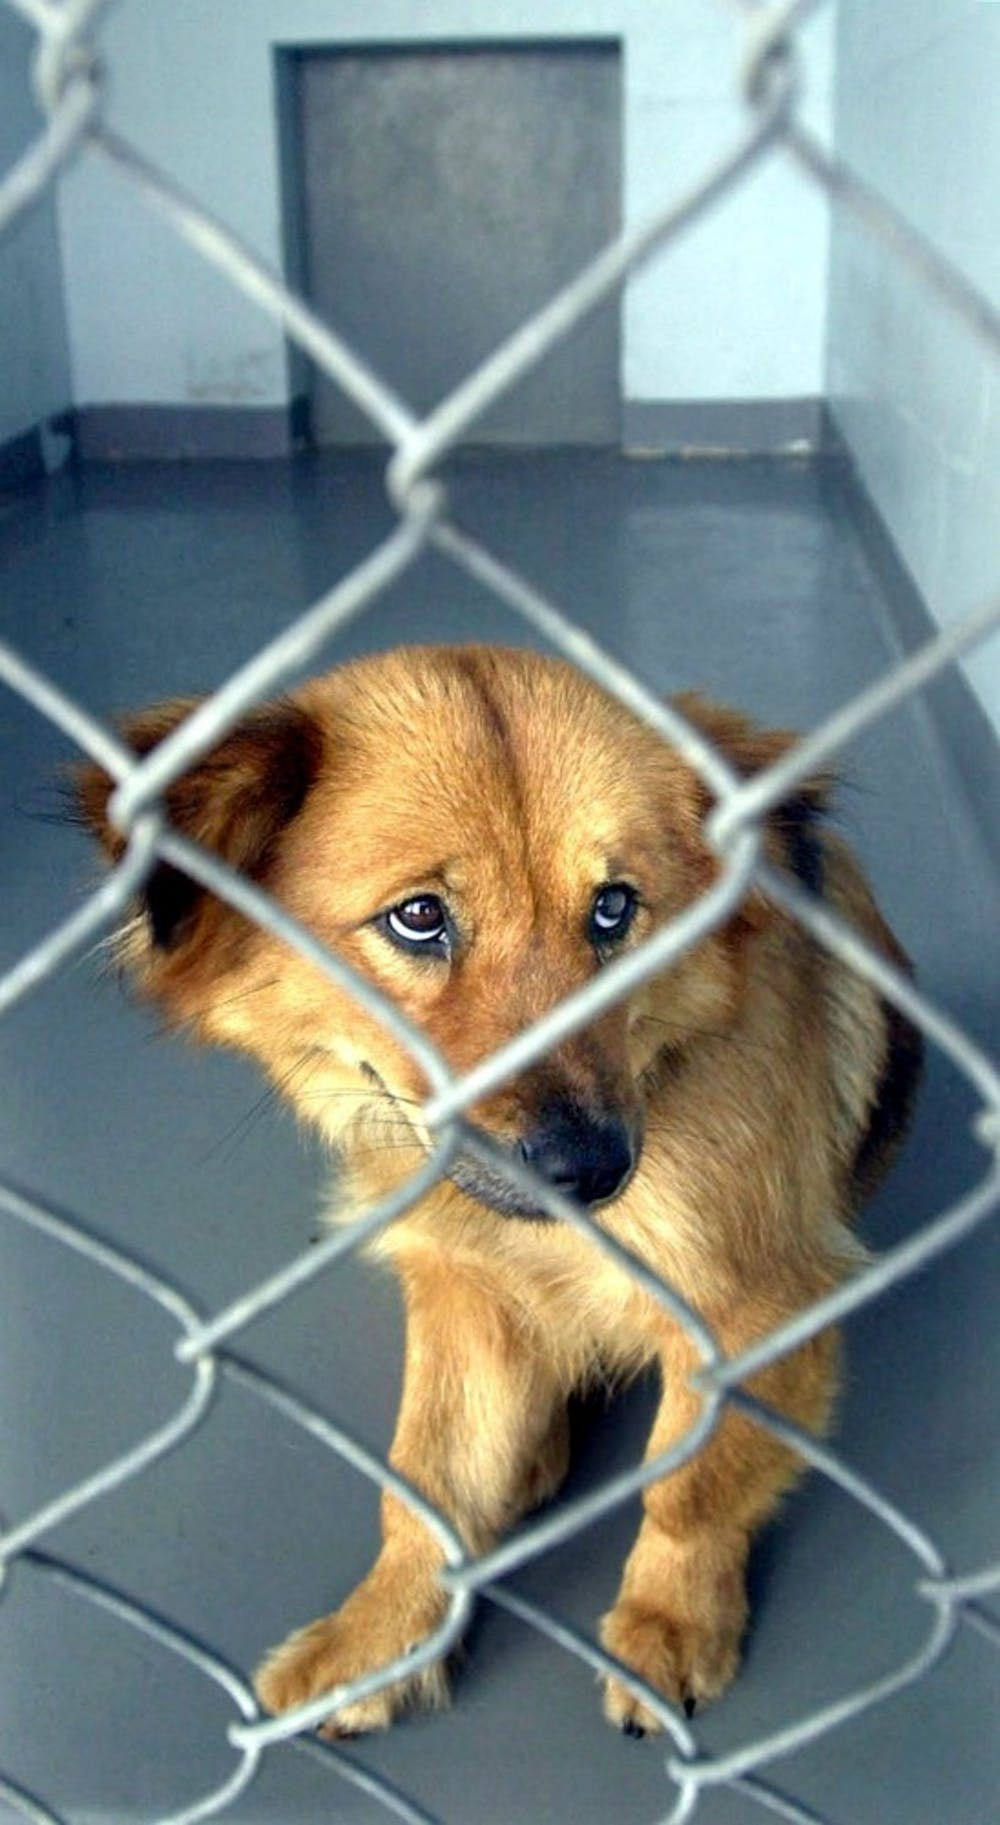 Pet stores, puppy mills cause bad behavior